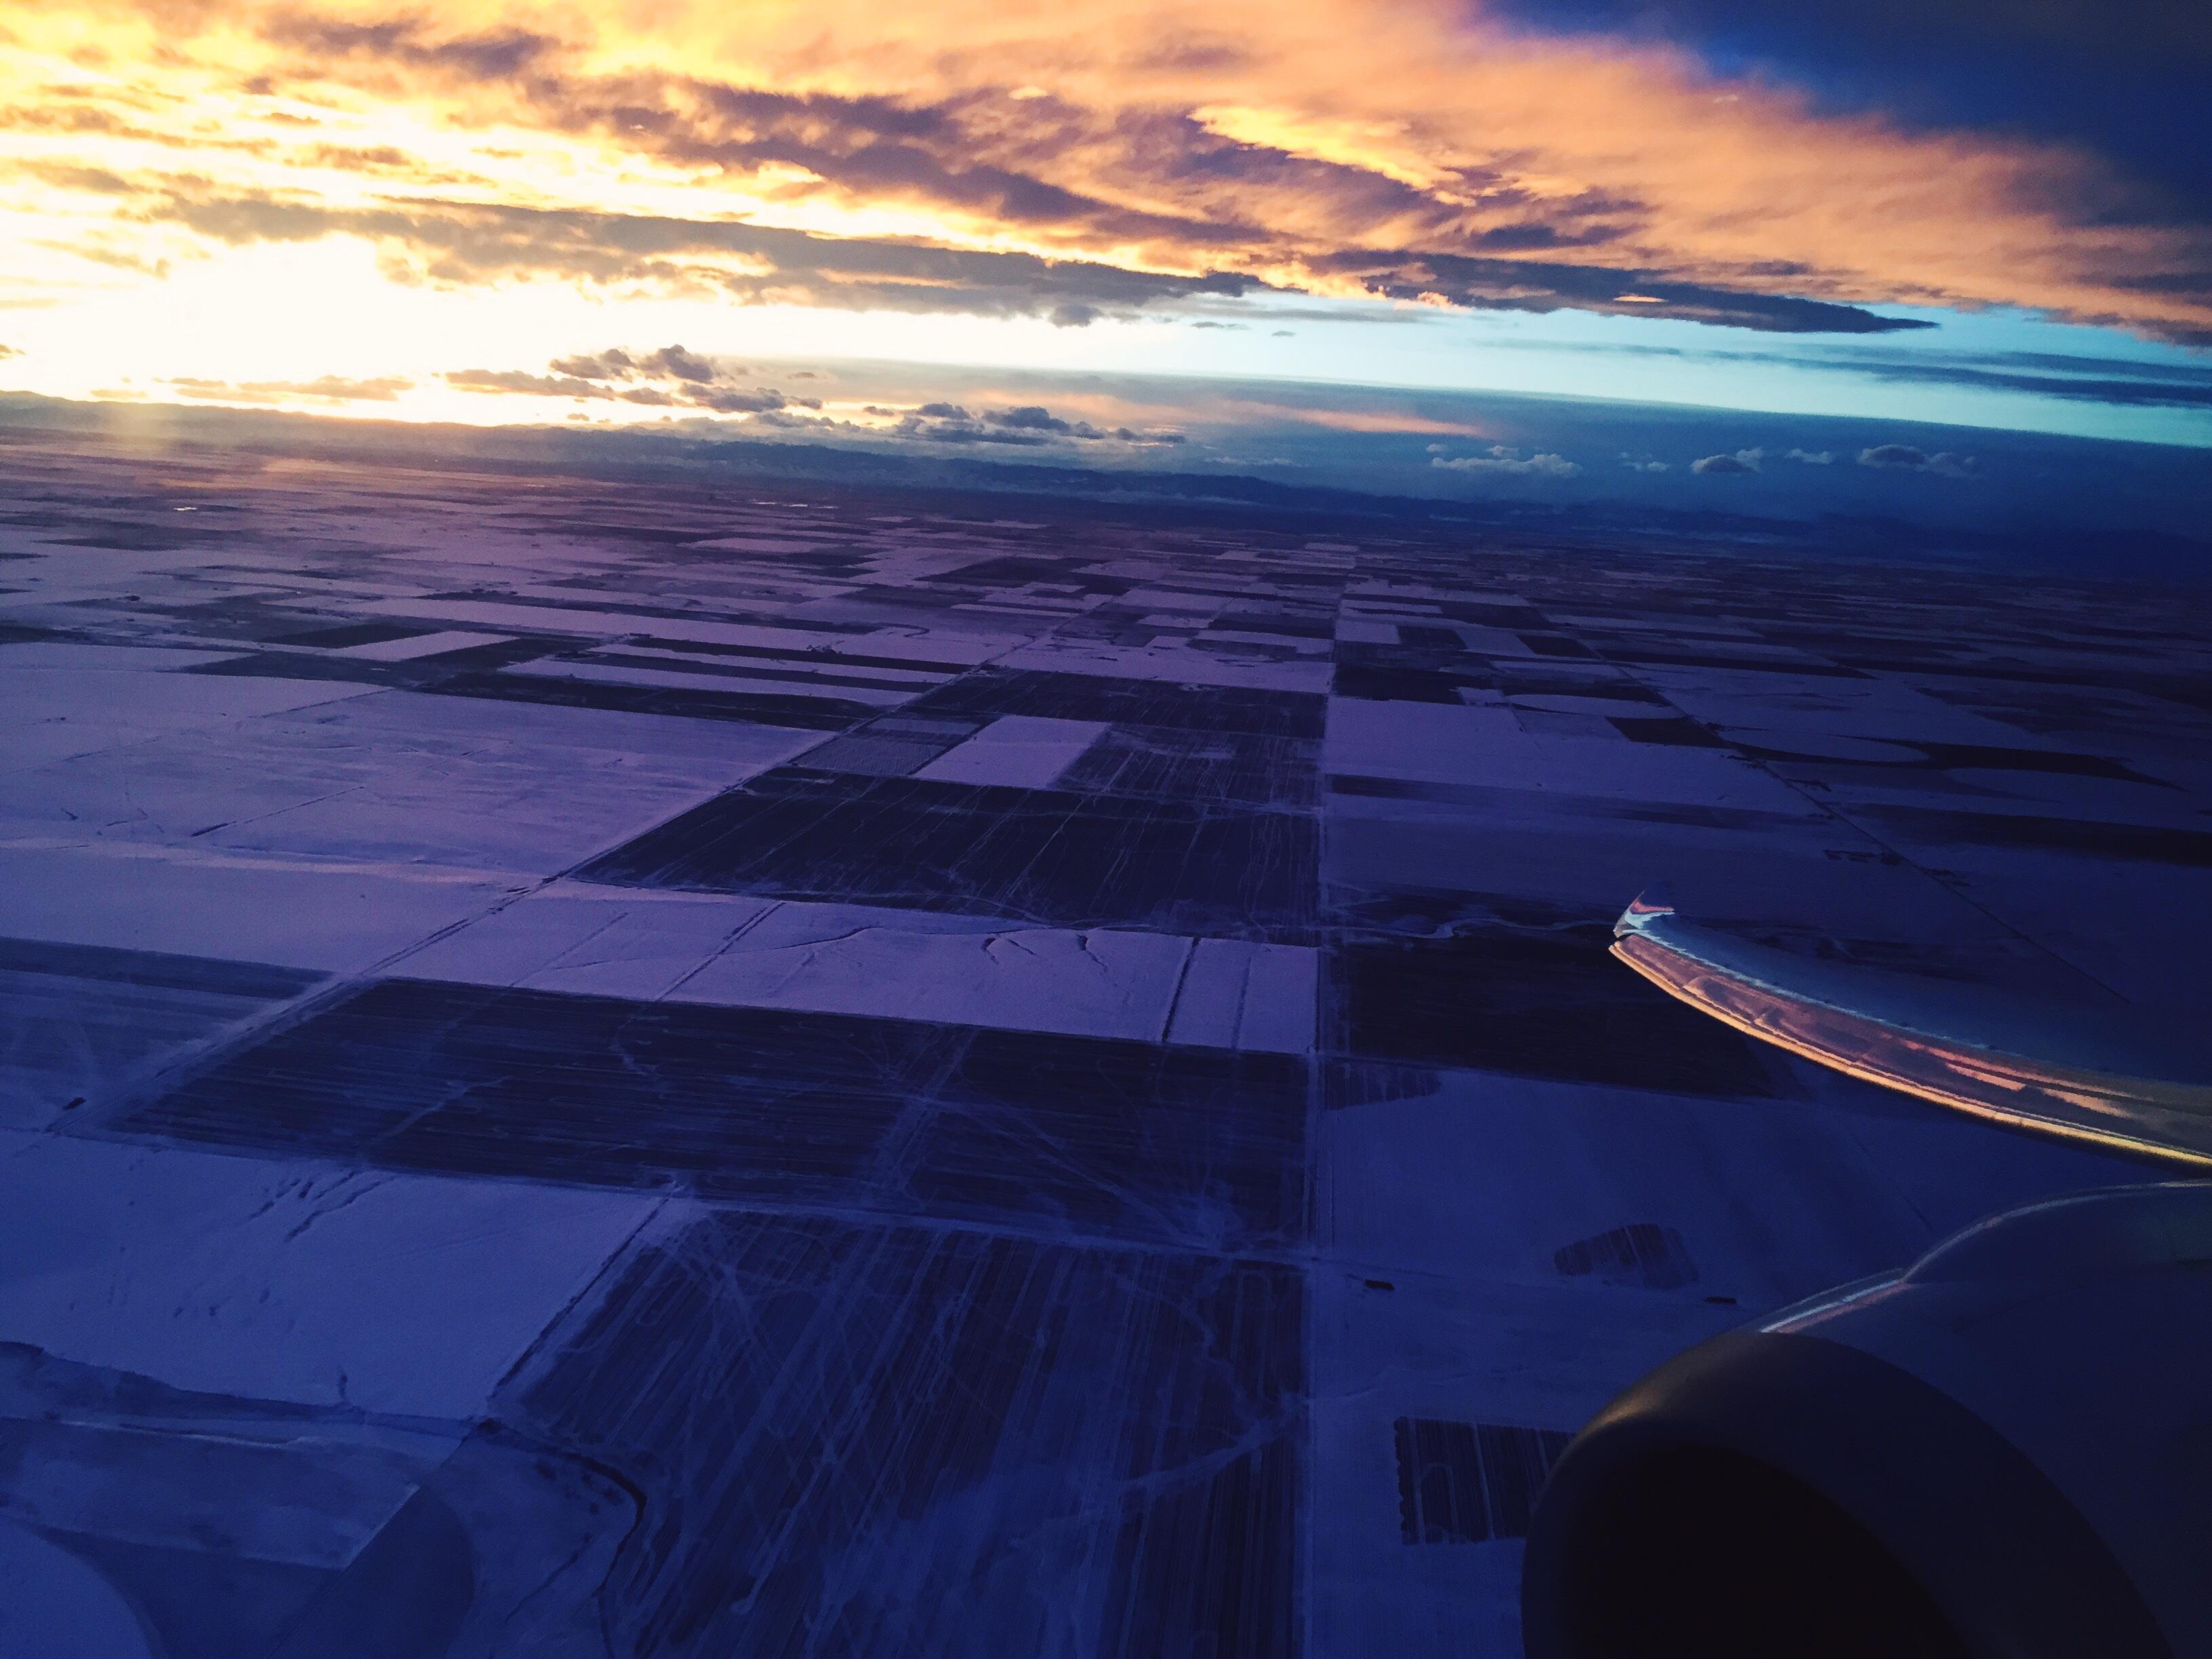 Sunset Over Fields, Blue, Fields, Journey, Landscape, HQ Photo